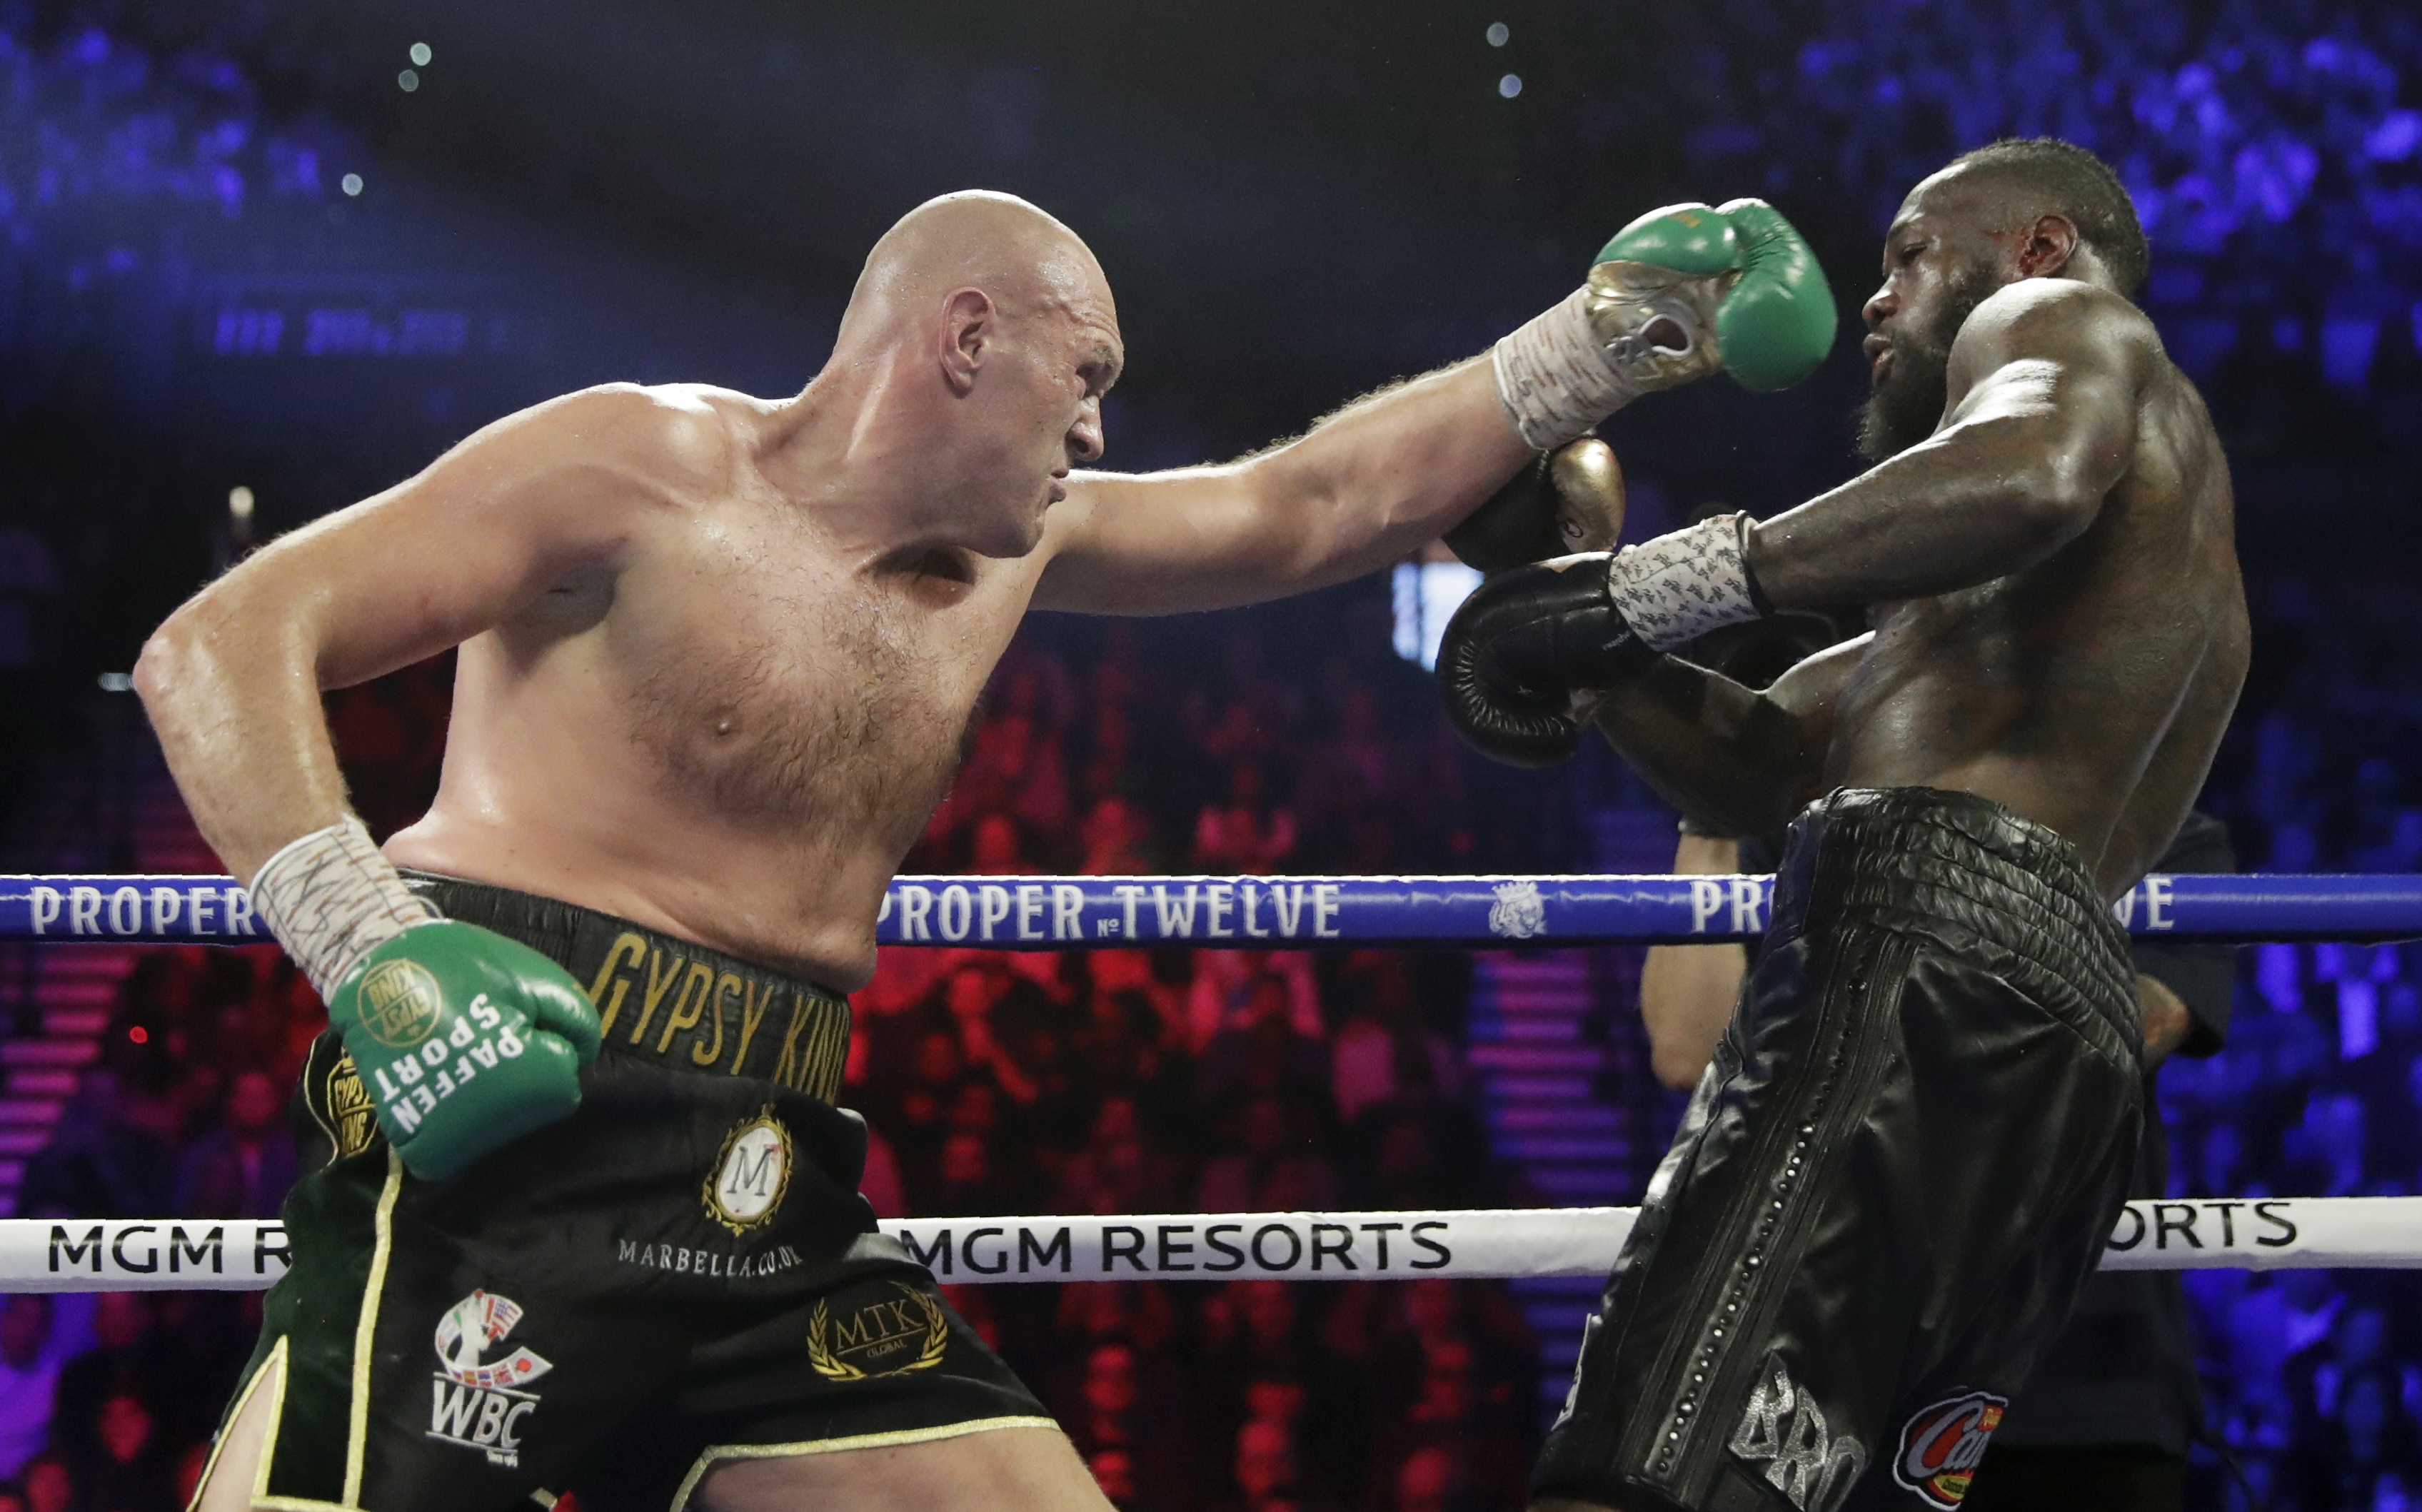 Tyson Fury, left, of England, fights Deontay Wilder during a WBC heavyweight championship boxing match Saturday, Feb. 22, 2020, in Las Vegas. (AP Photo/Isaac Brekken)